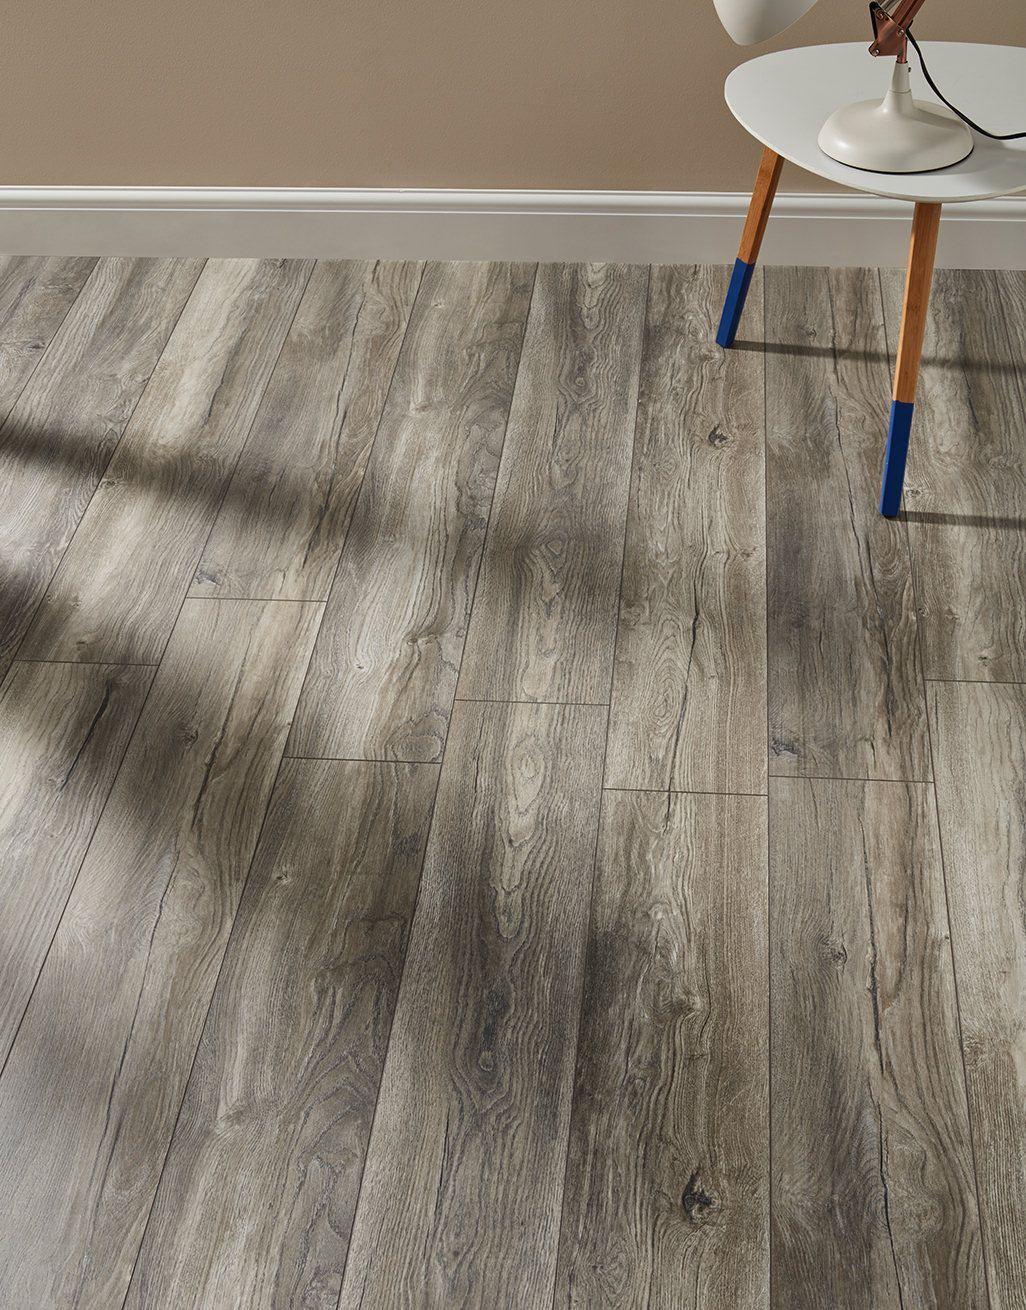 Harbour Oak Grey Laminate Flooring, Villa Laminate Flooring